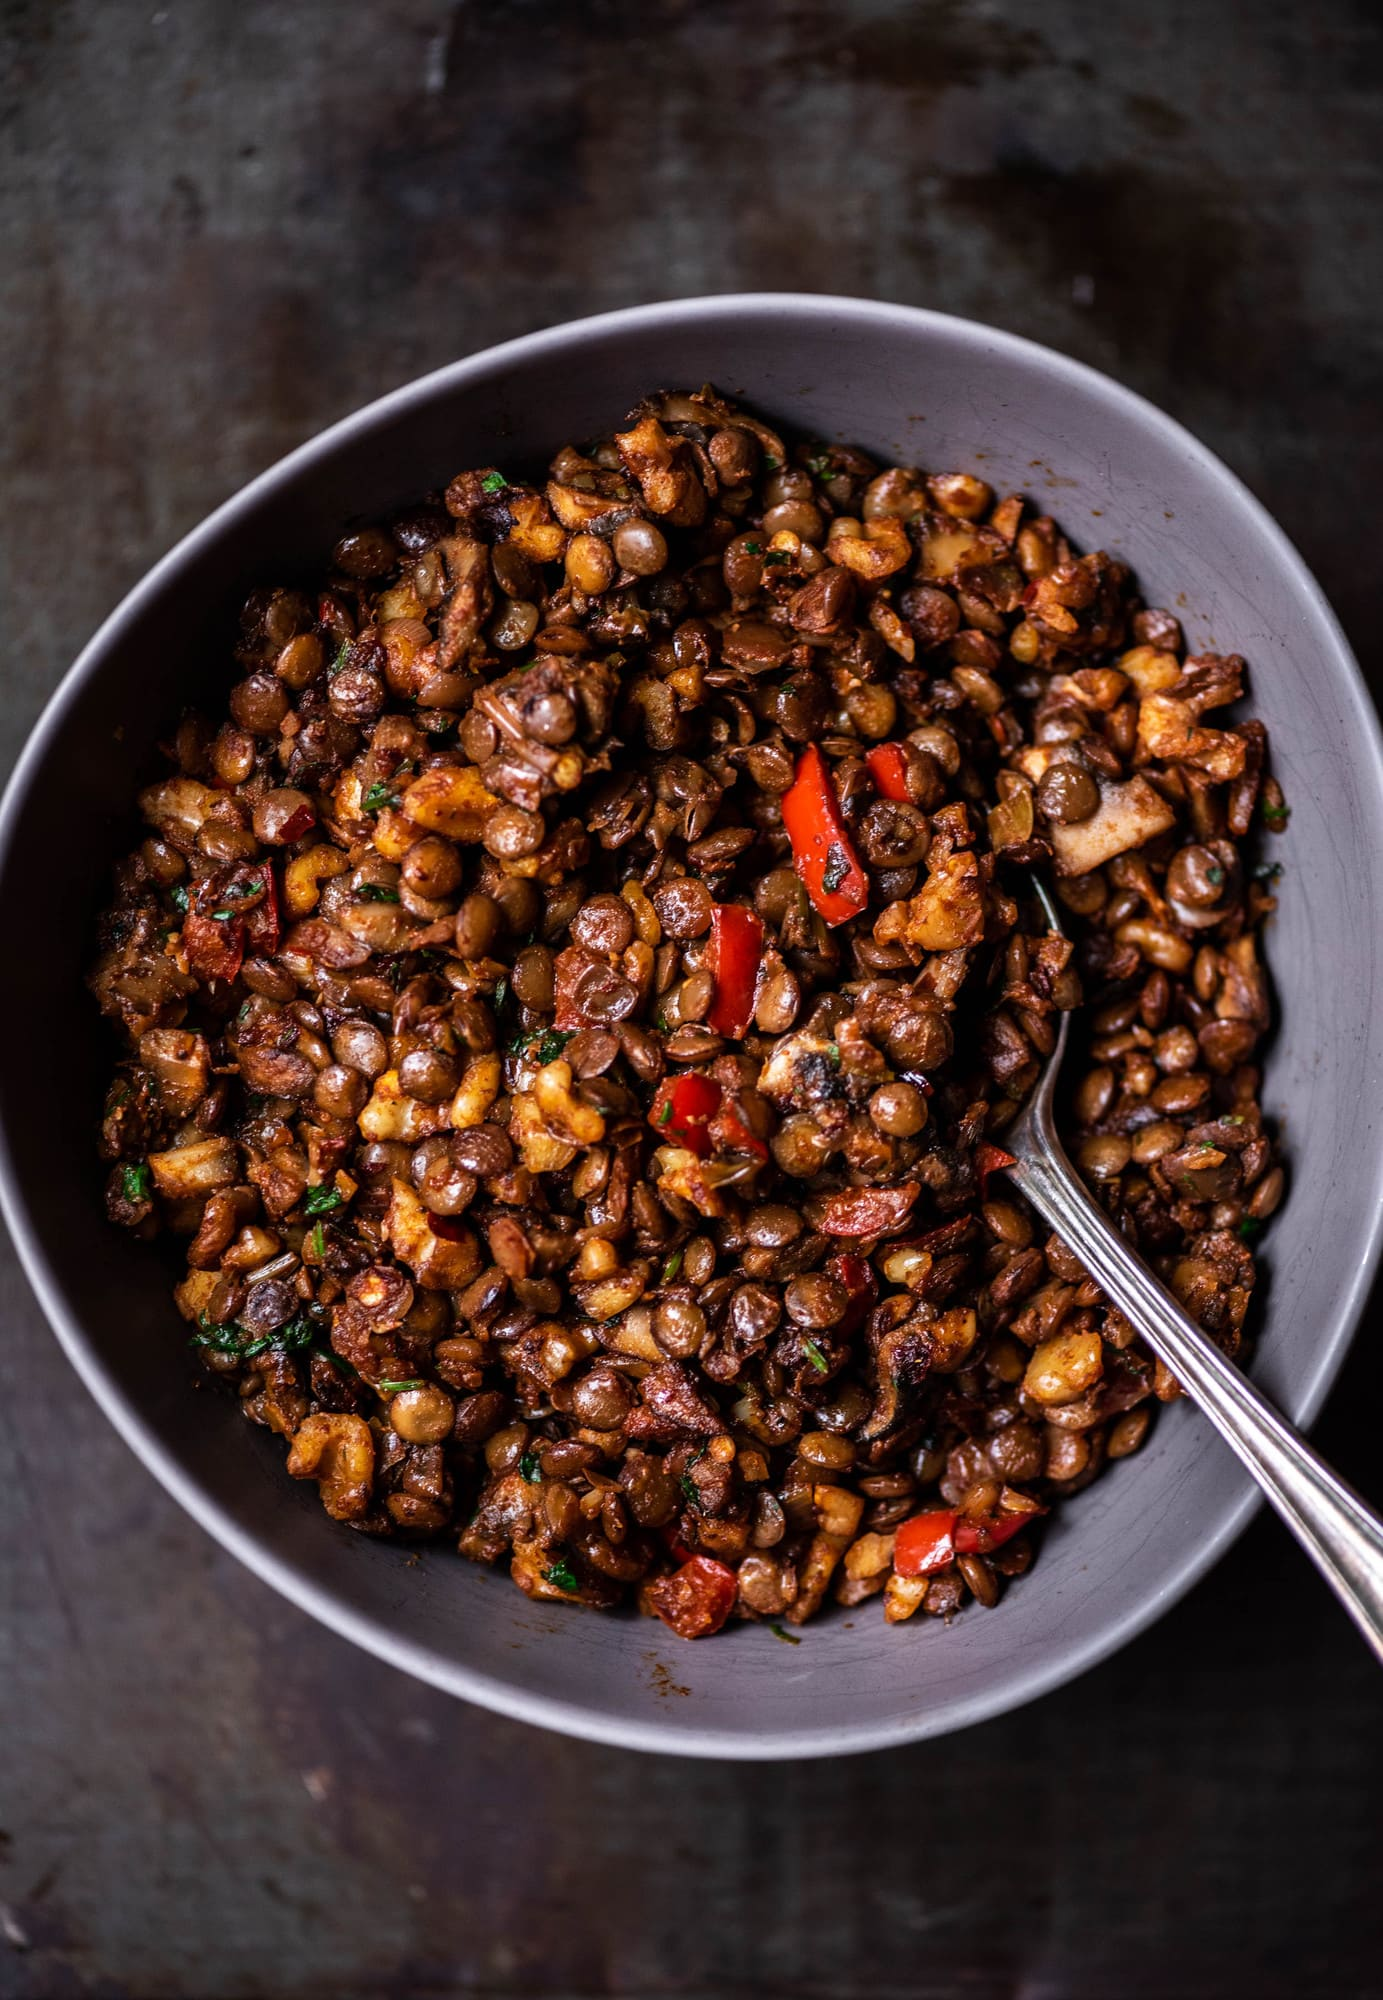 Close up of vegan lentil walnut taco filling in a gray mixing bowl